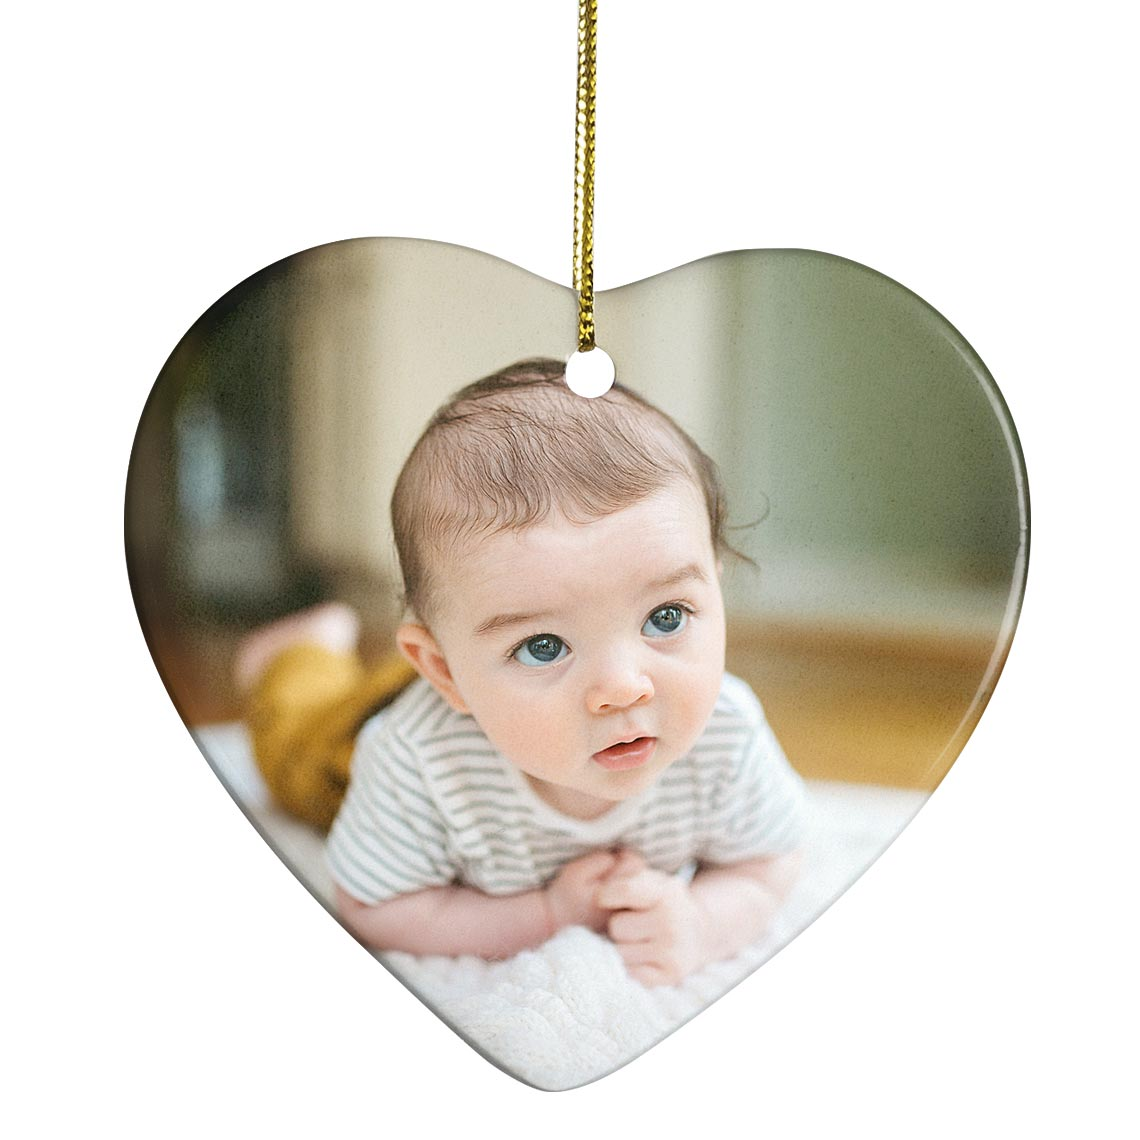 Heart (porcelain)